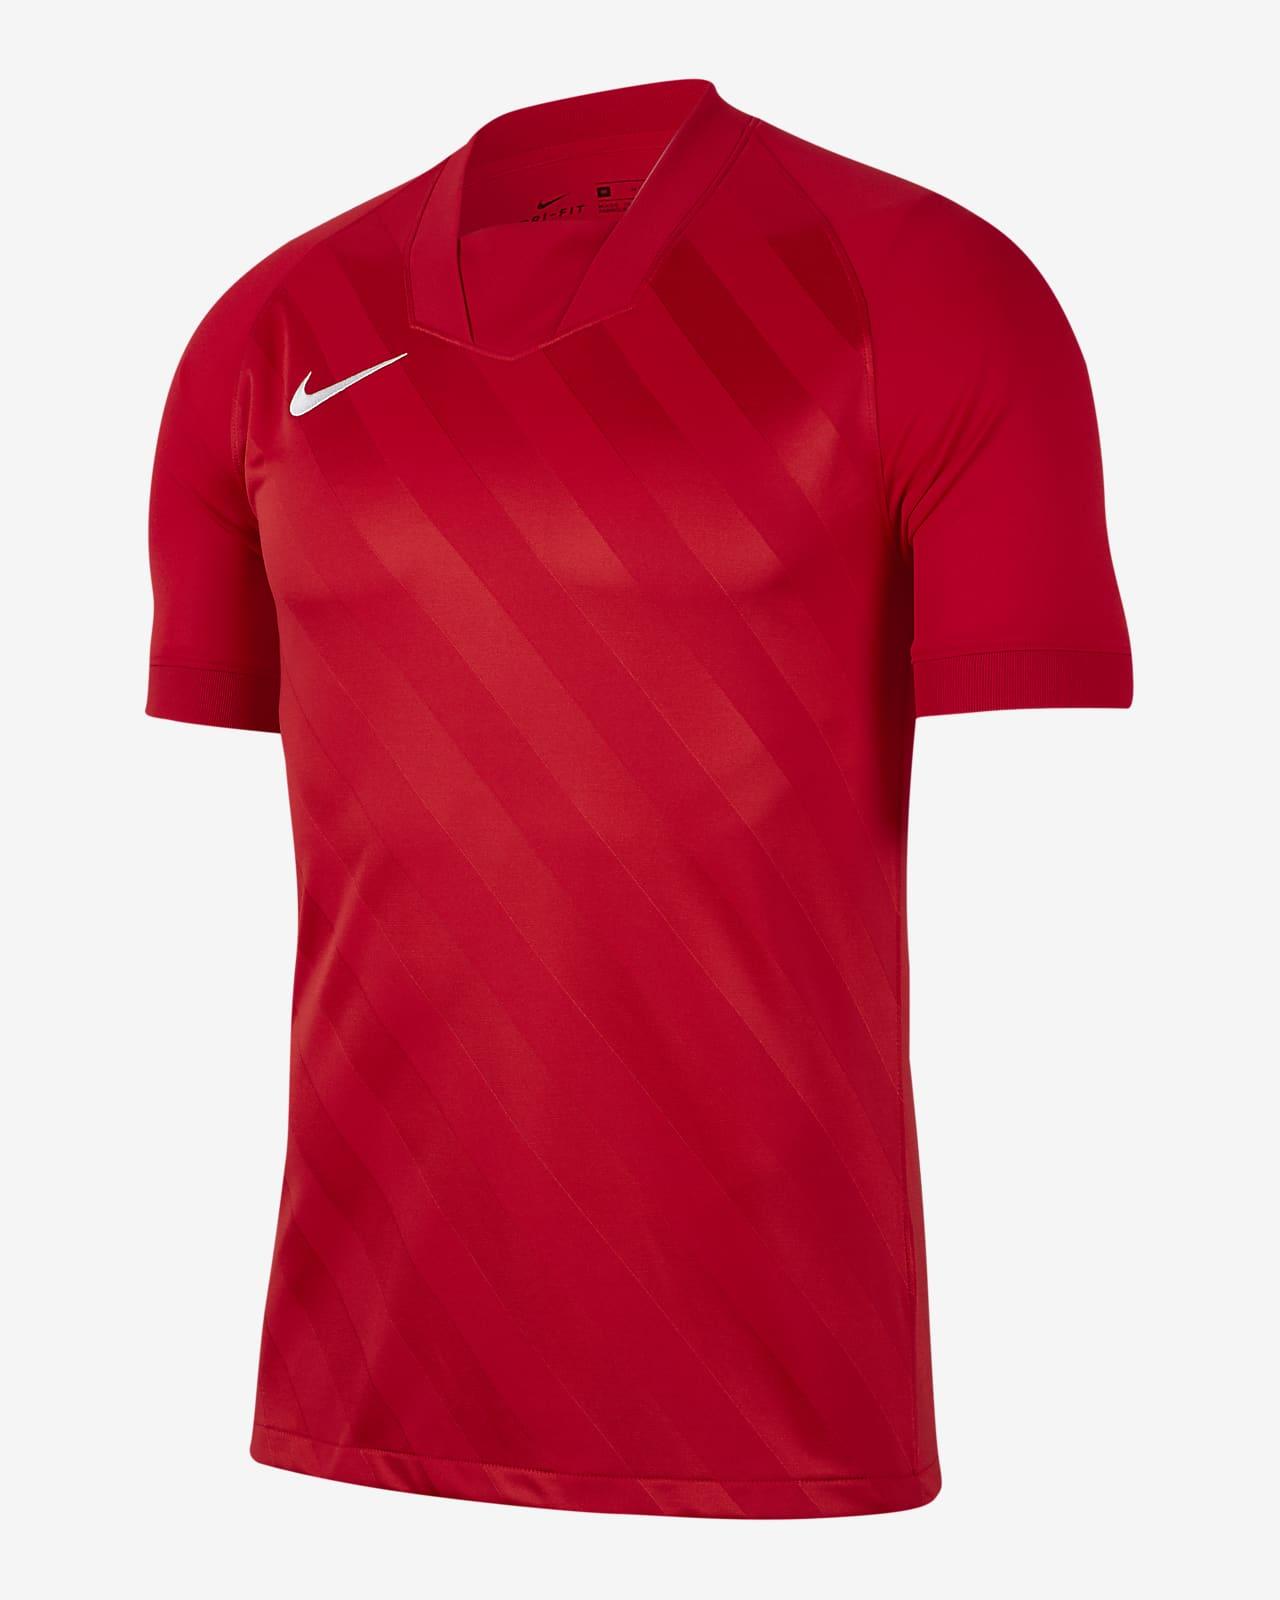 Nike Dri-FIT Challenge 3 Men's Football Shirt